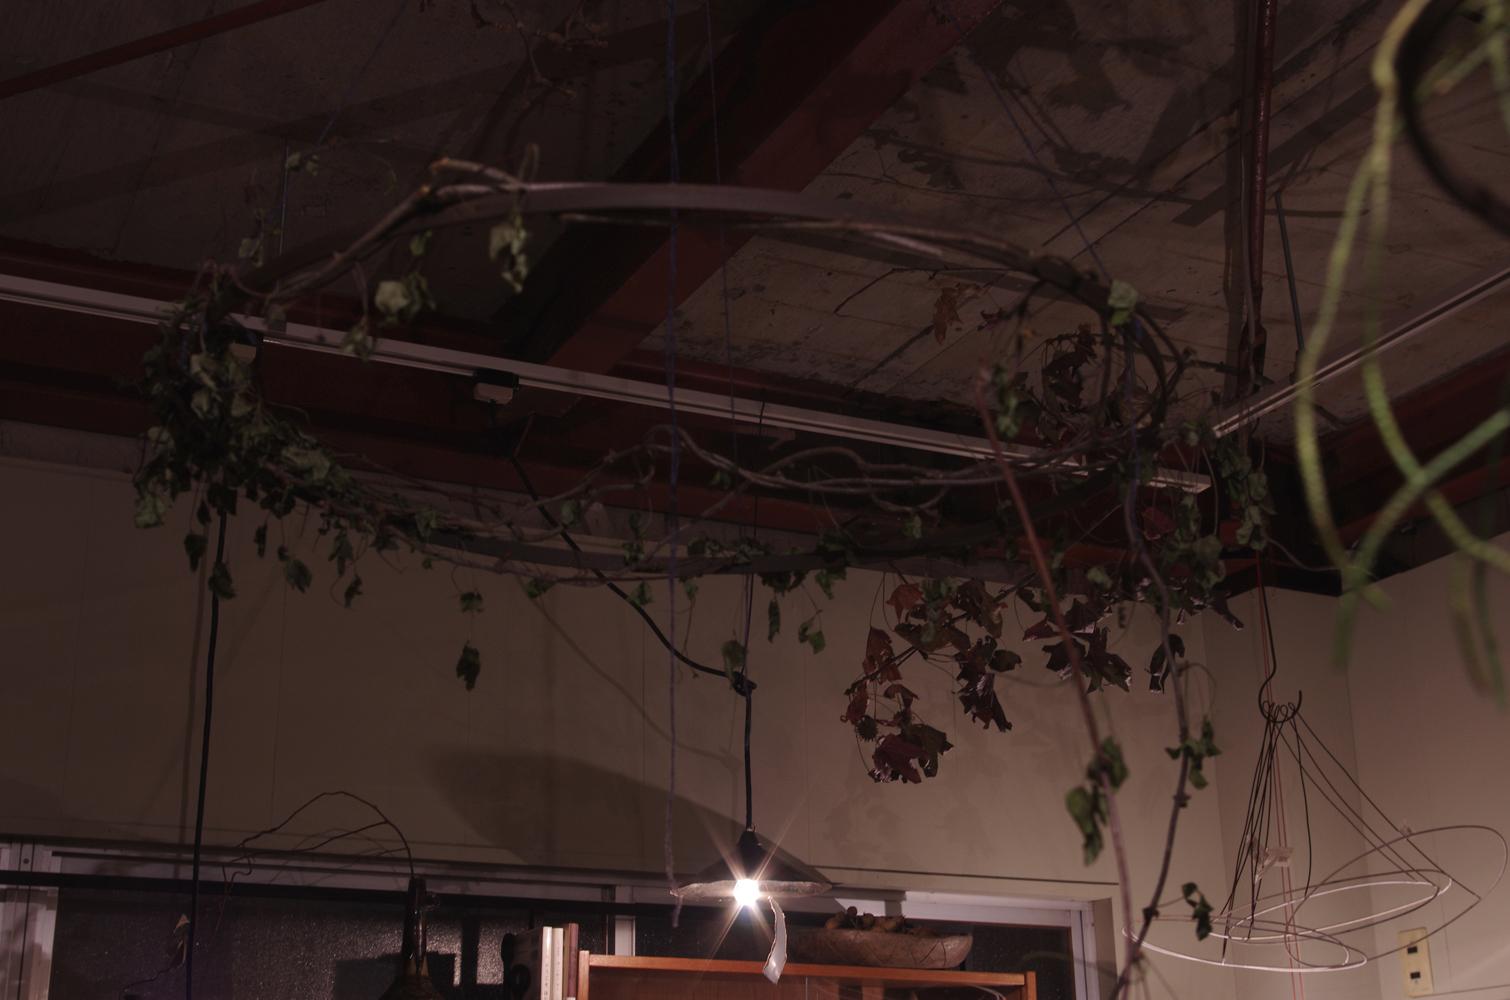 tipura-studio-ironworks-exhibition-14